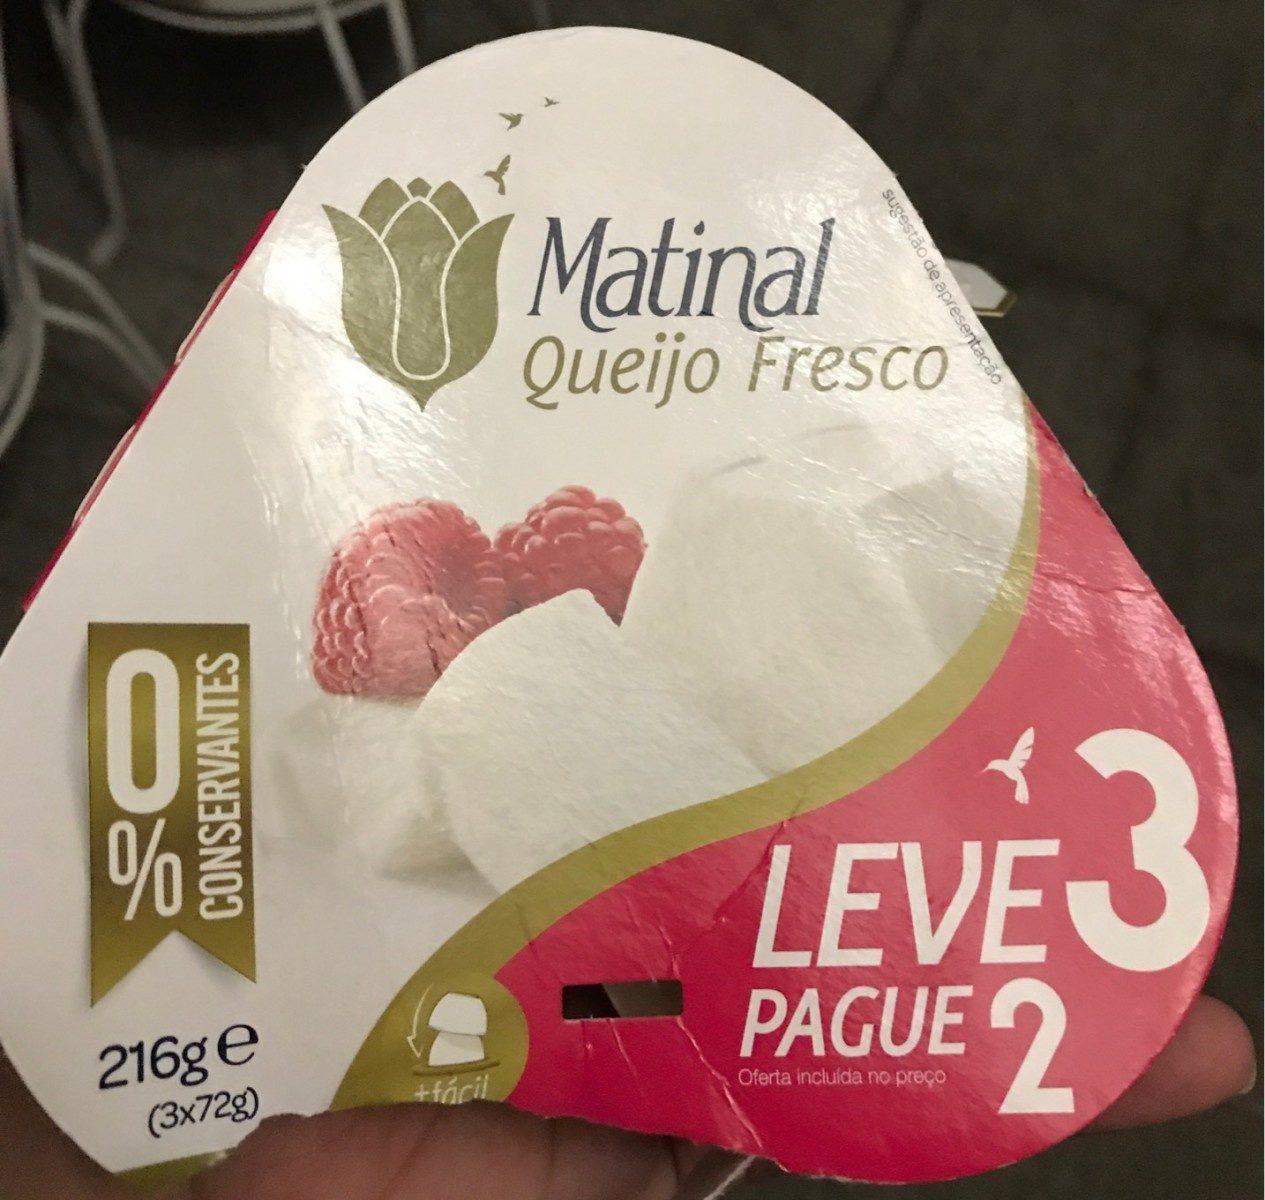 Qeijo fresco - Product